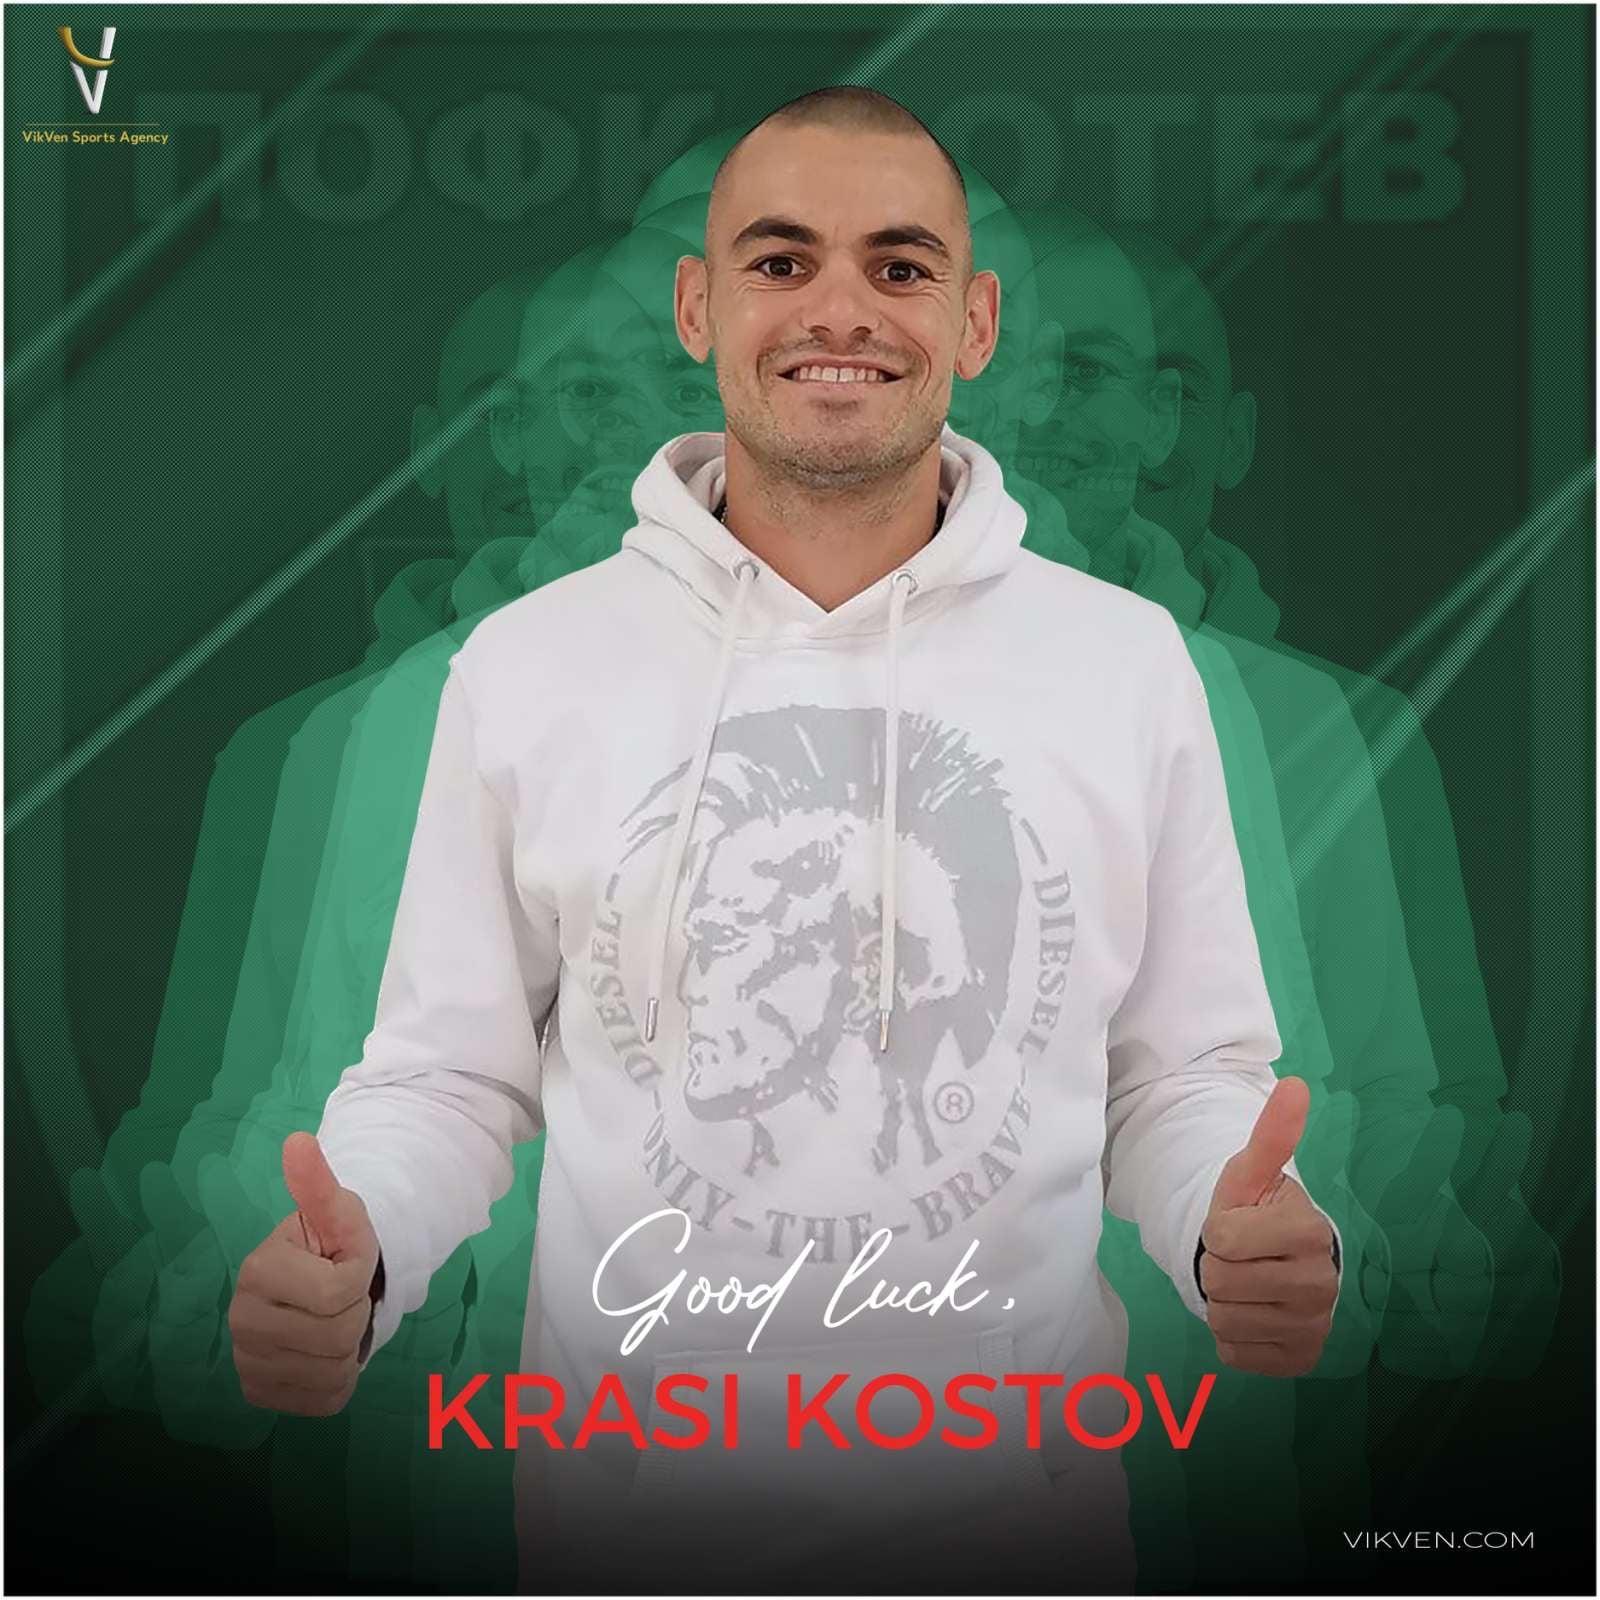 Krasimir Kostov Extended His Contract With Botev Vratza